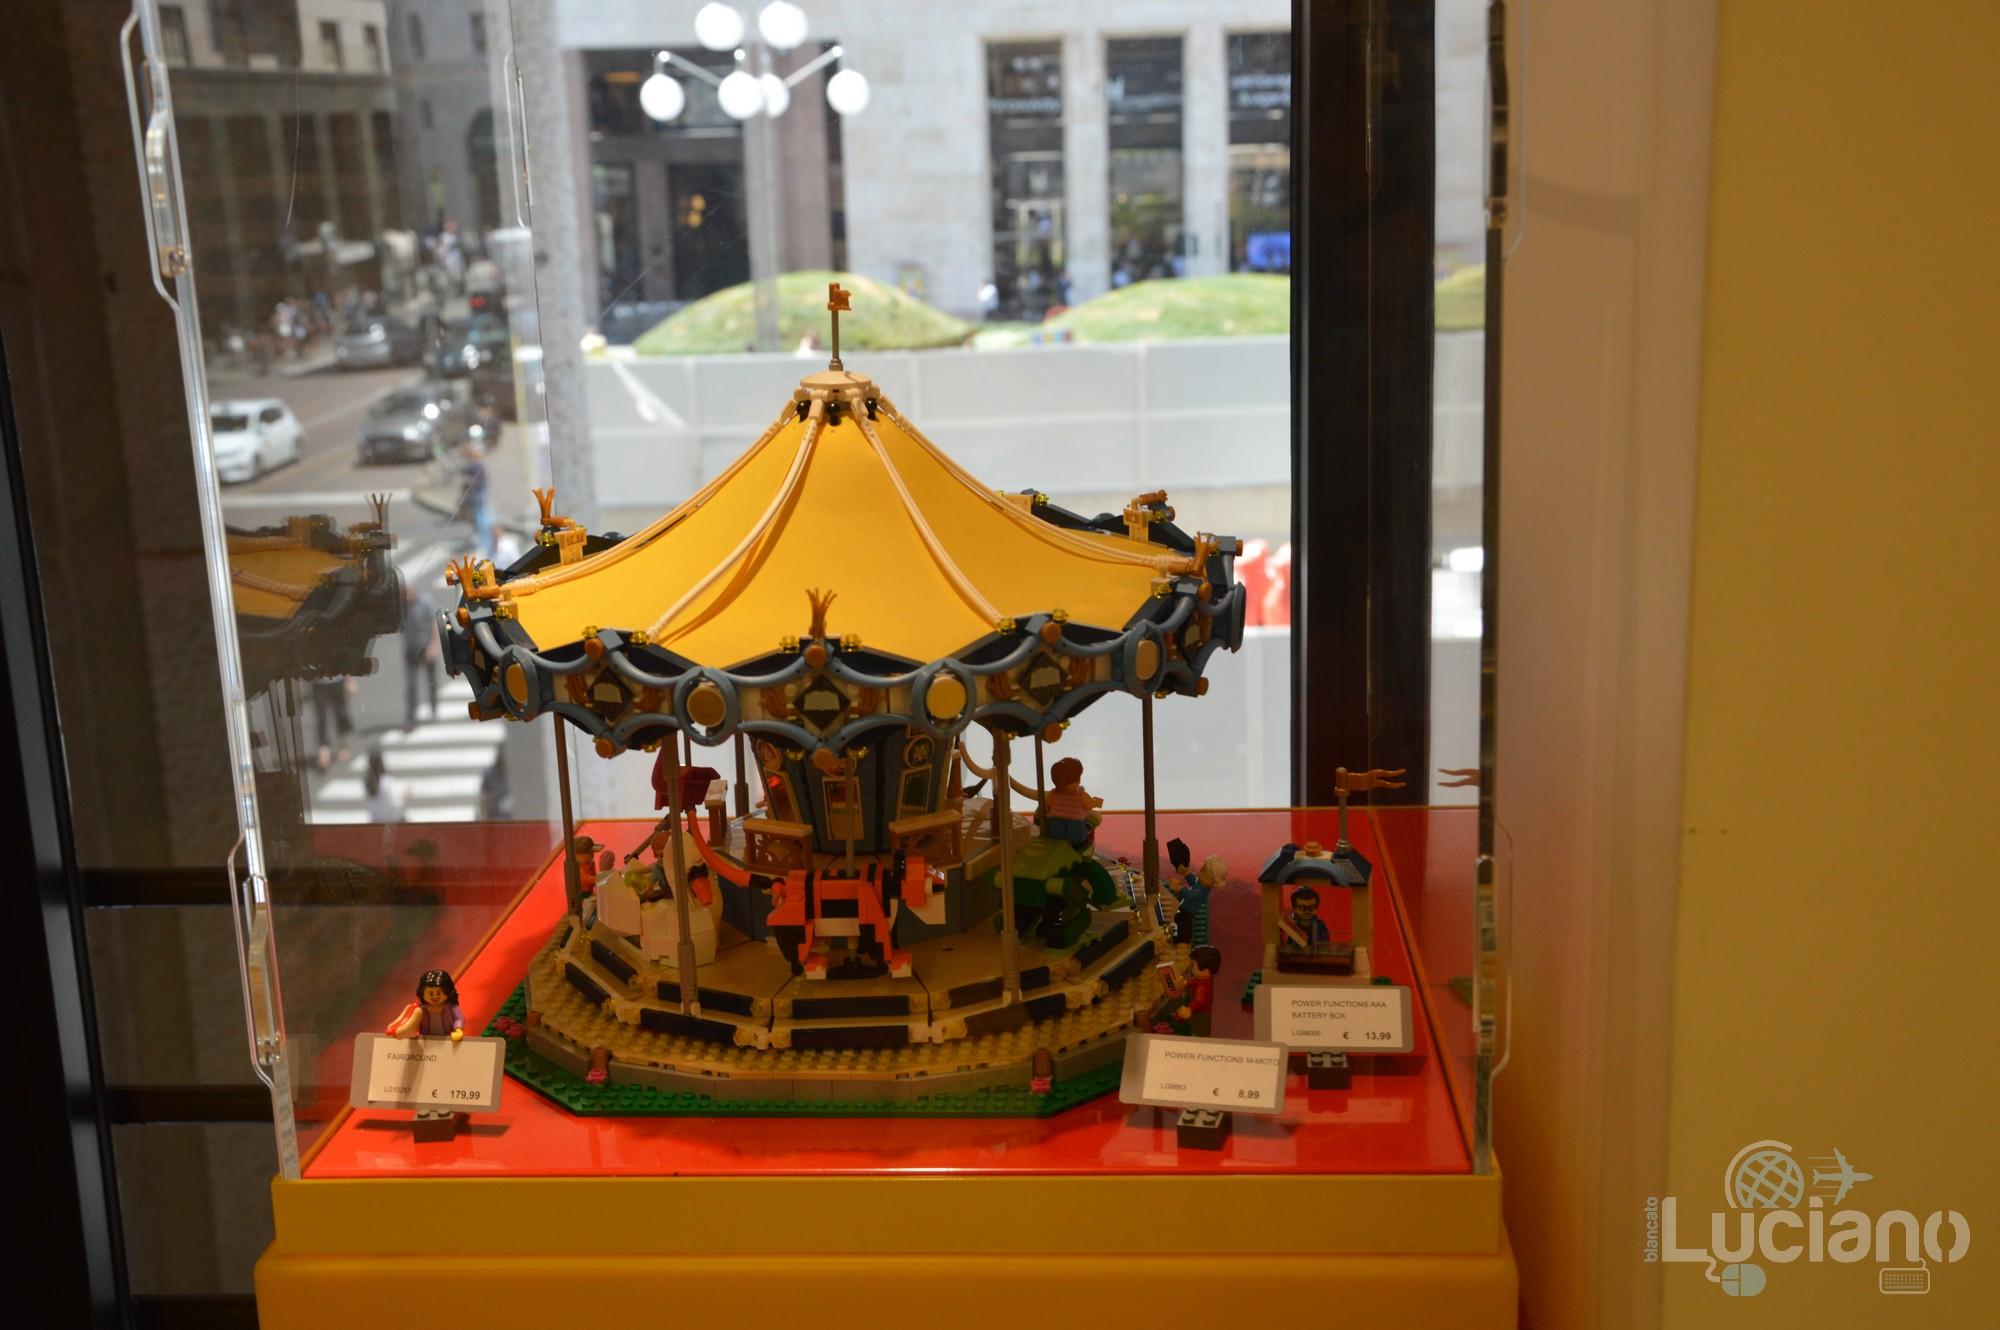 Lego Store - Modellino Carosello - Milano - Lombardia - Italia